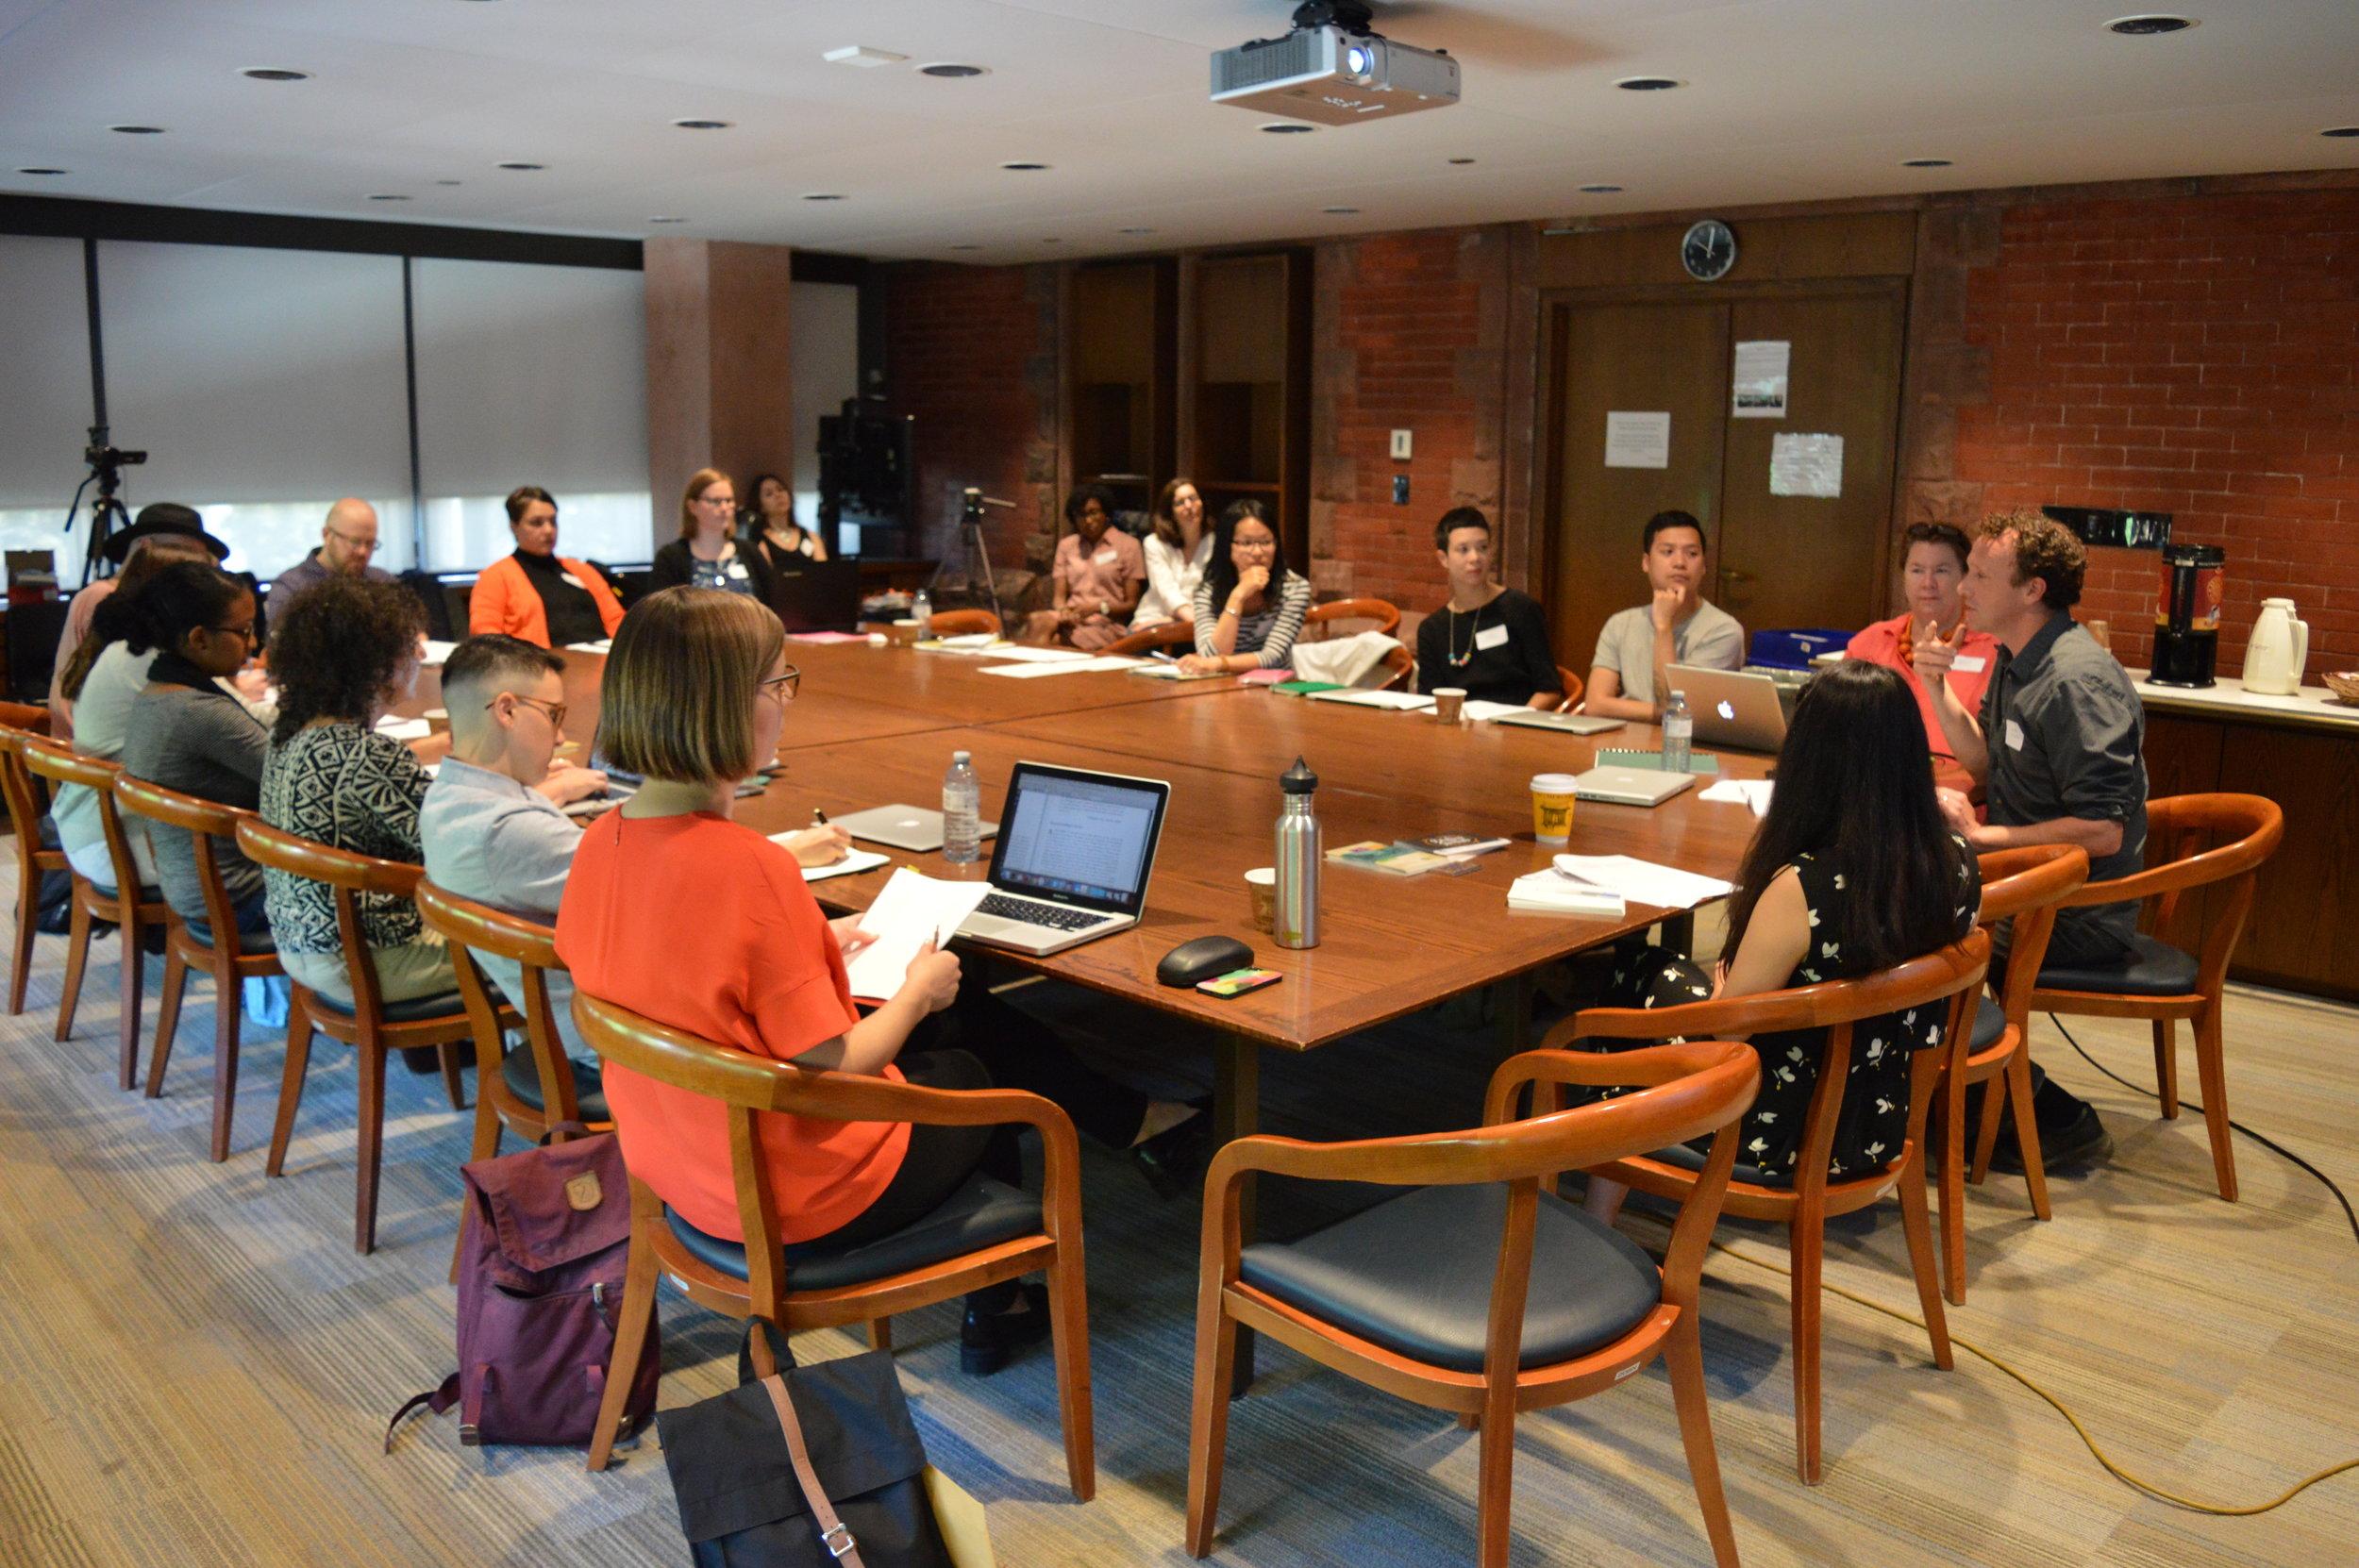 Oral History workshop I (C. Barreto, 2016)